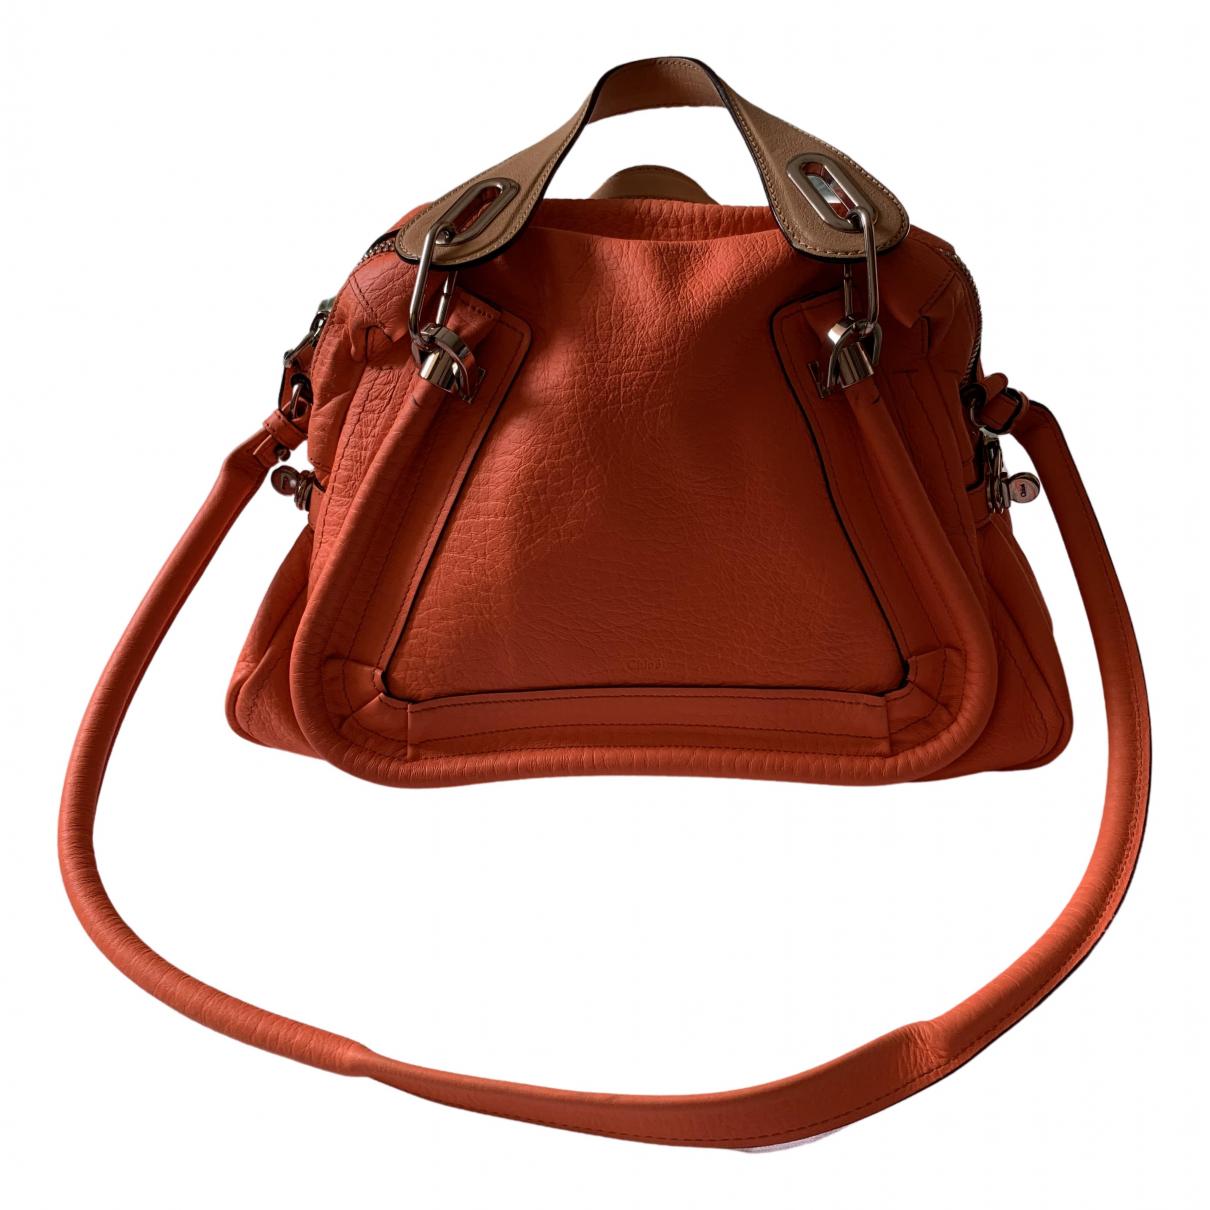 Chloé Paraty Orange Leather handbag for Women \N